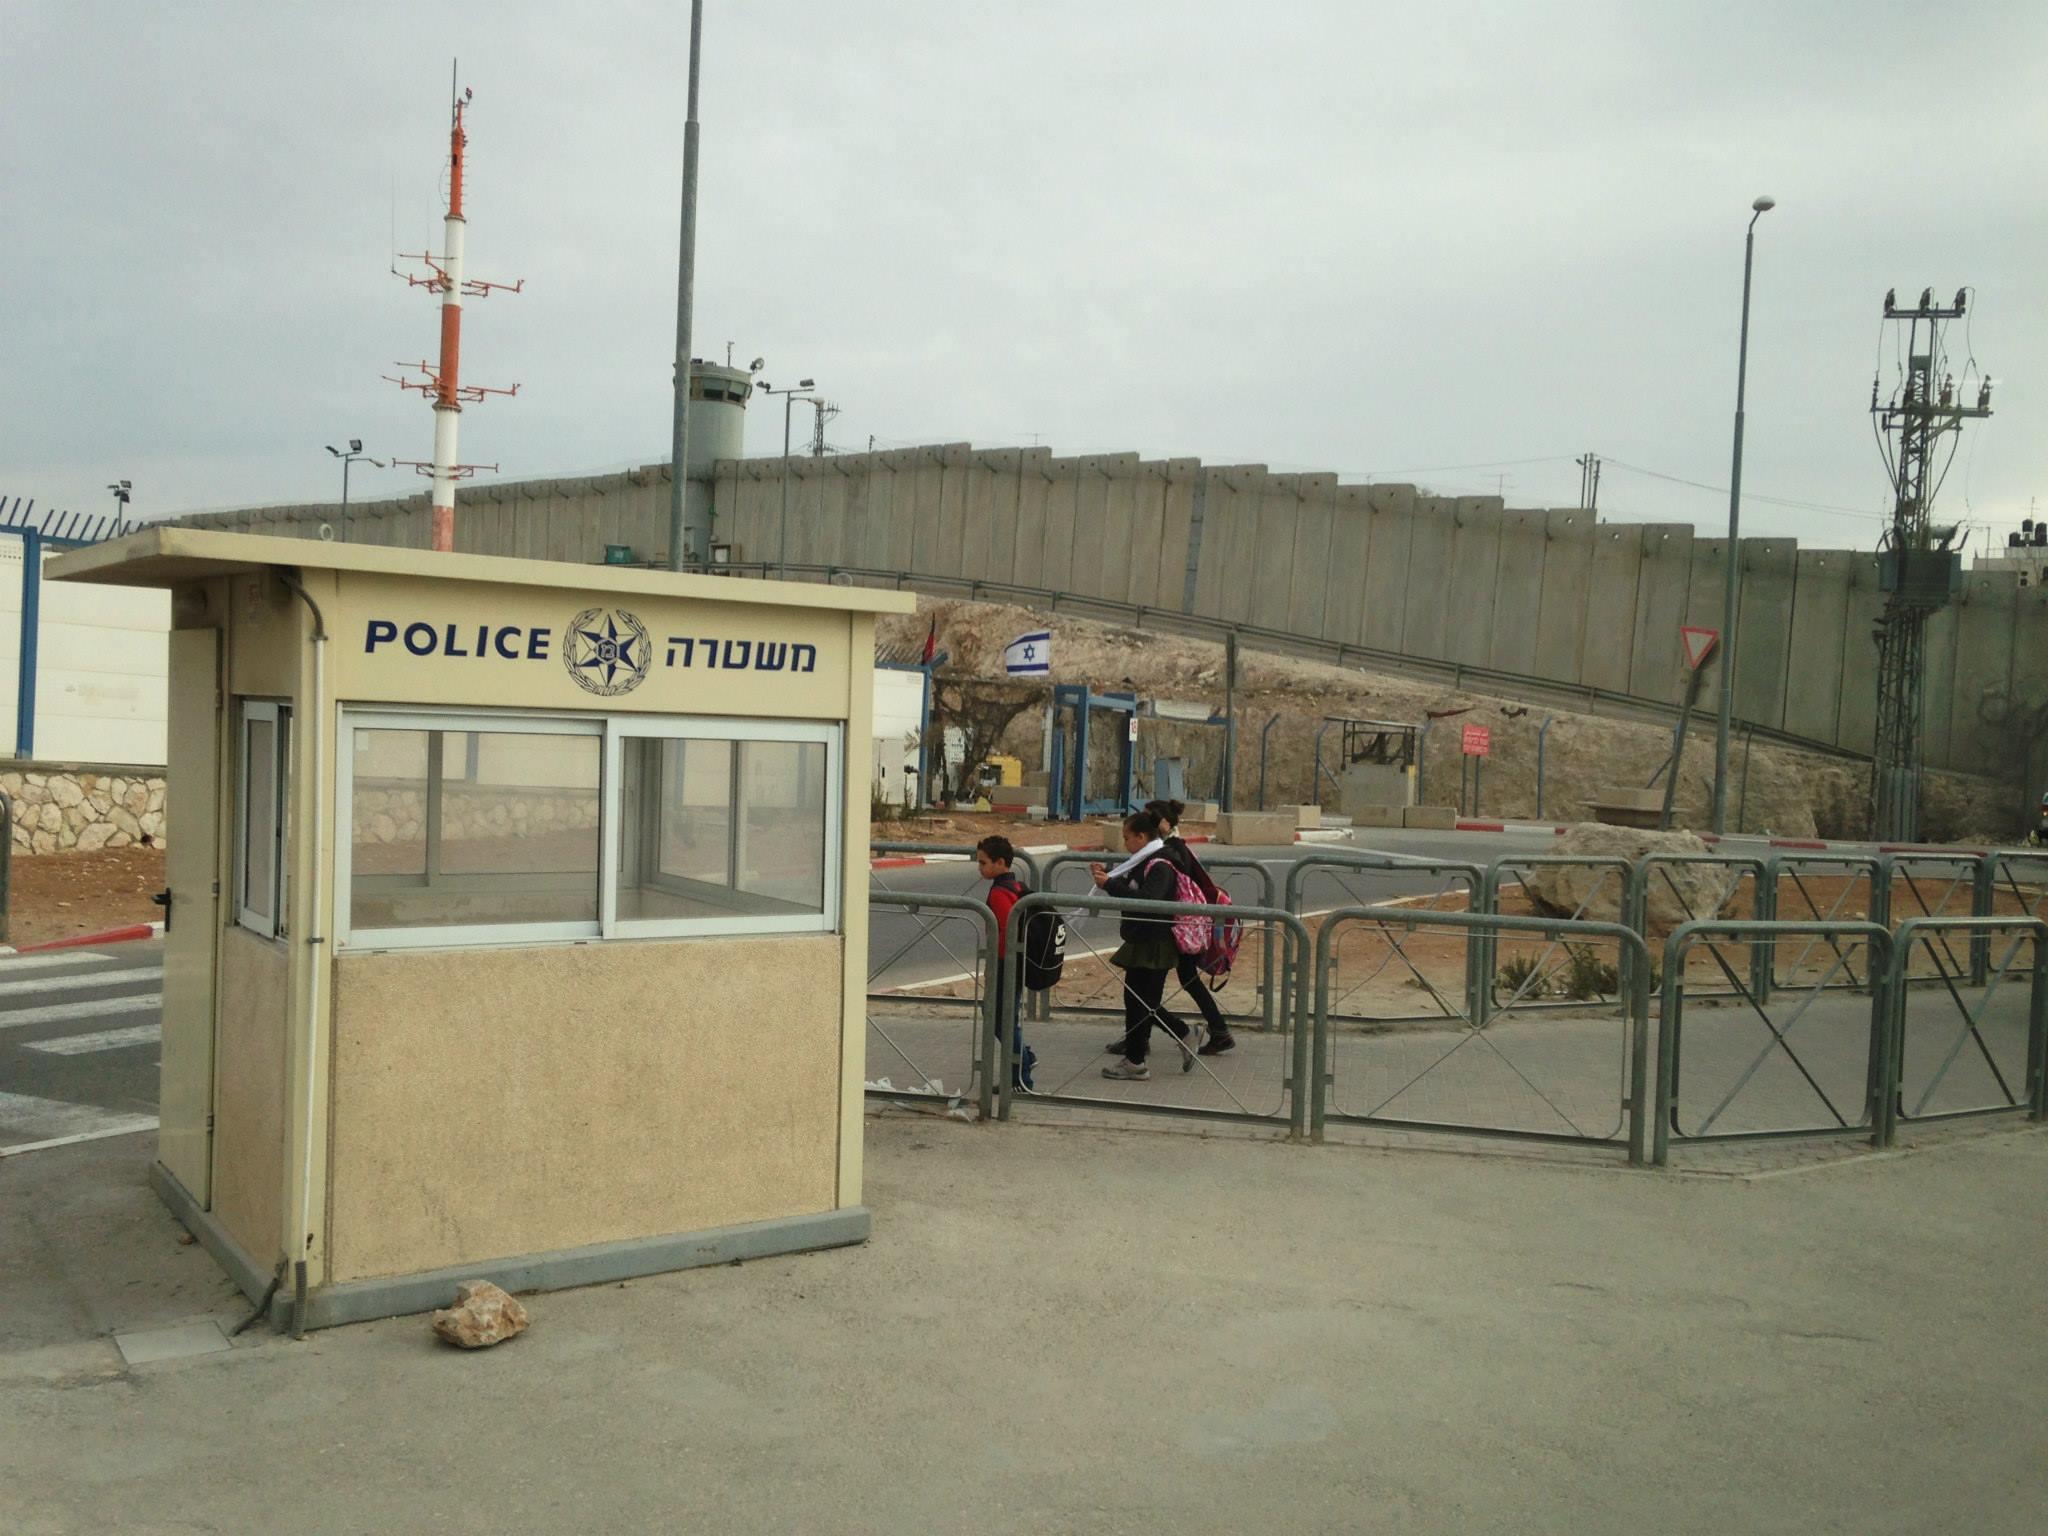 Vlak na de grens tussen Israël en Palestina